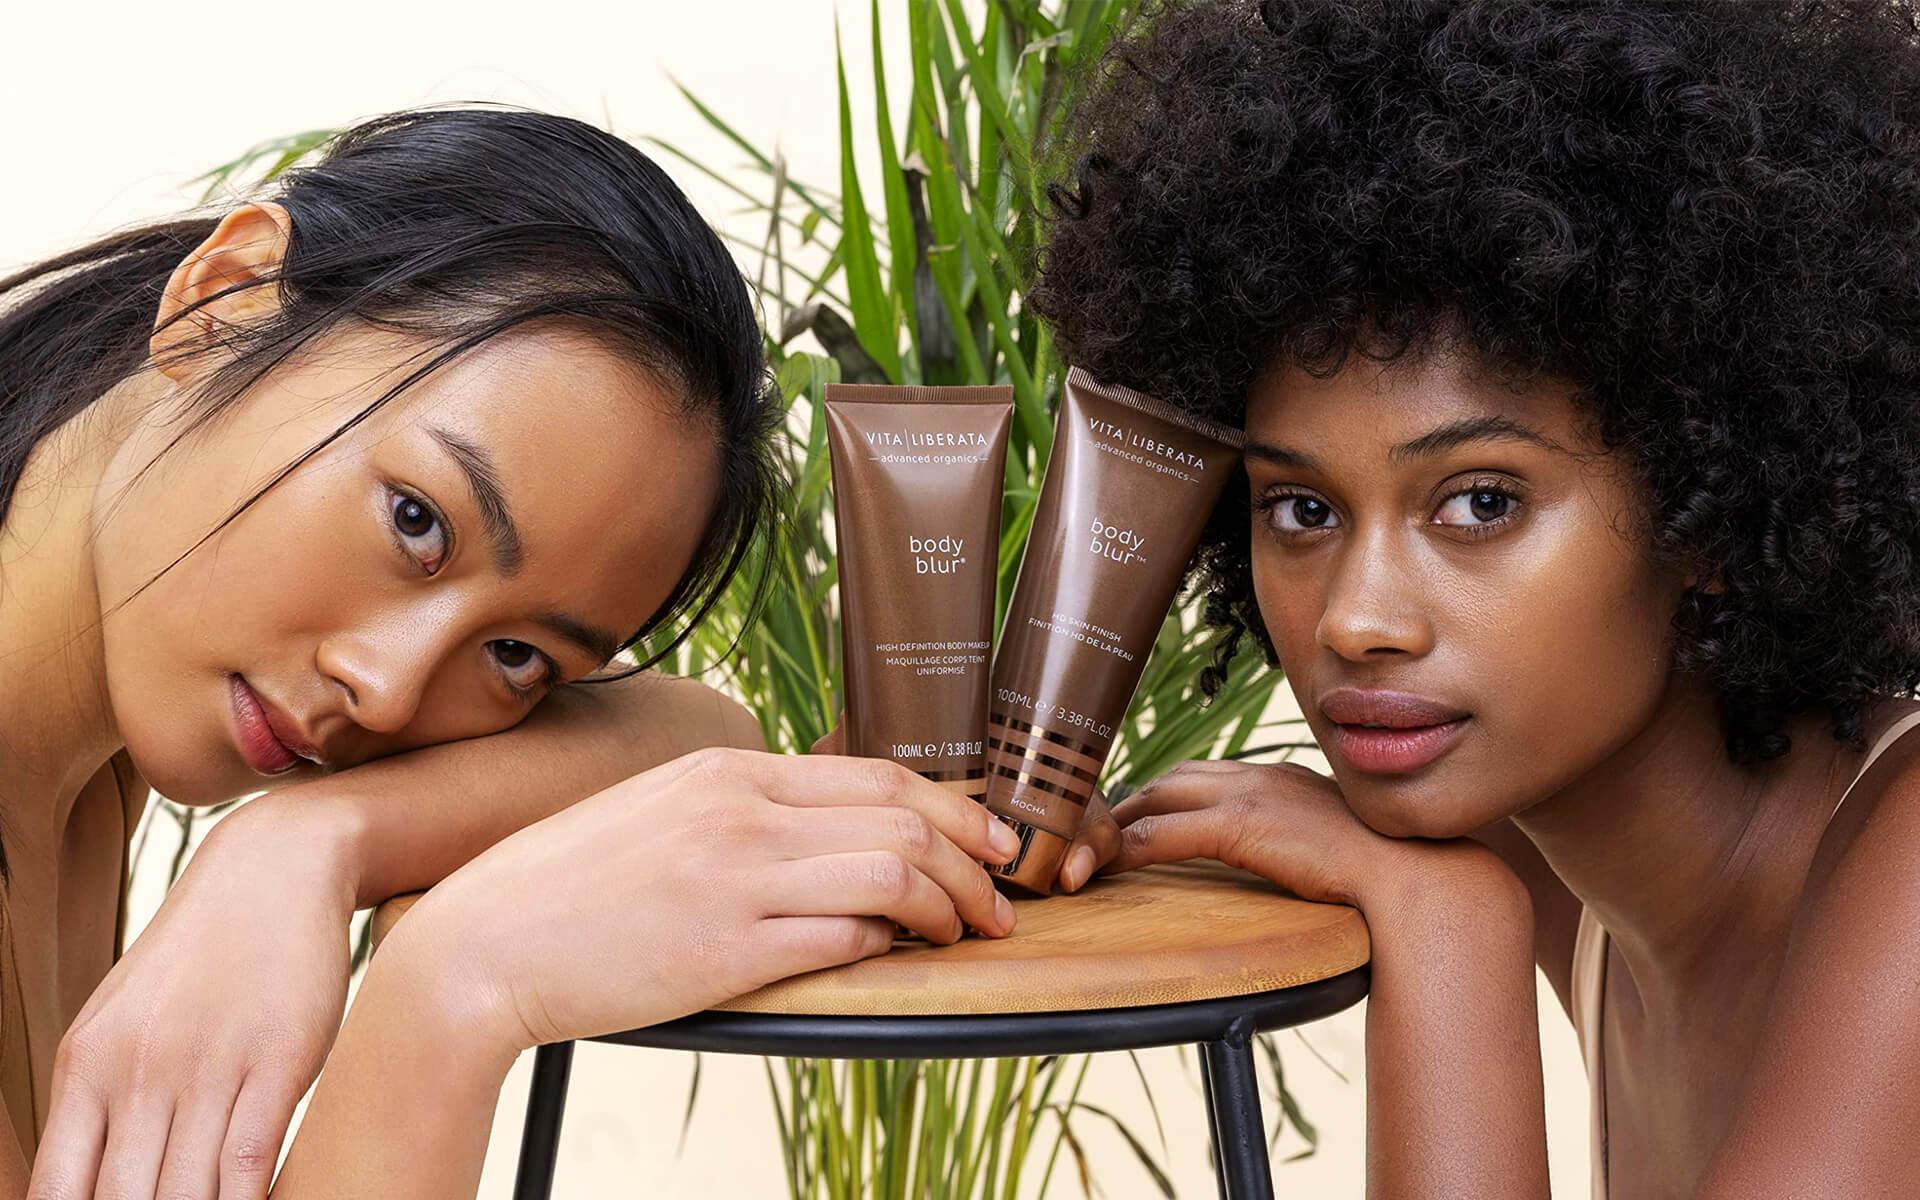 Beauty Marketing Agency Photo Feature of Two Women Holding Vita Liberata Products